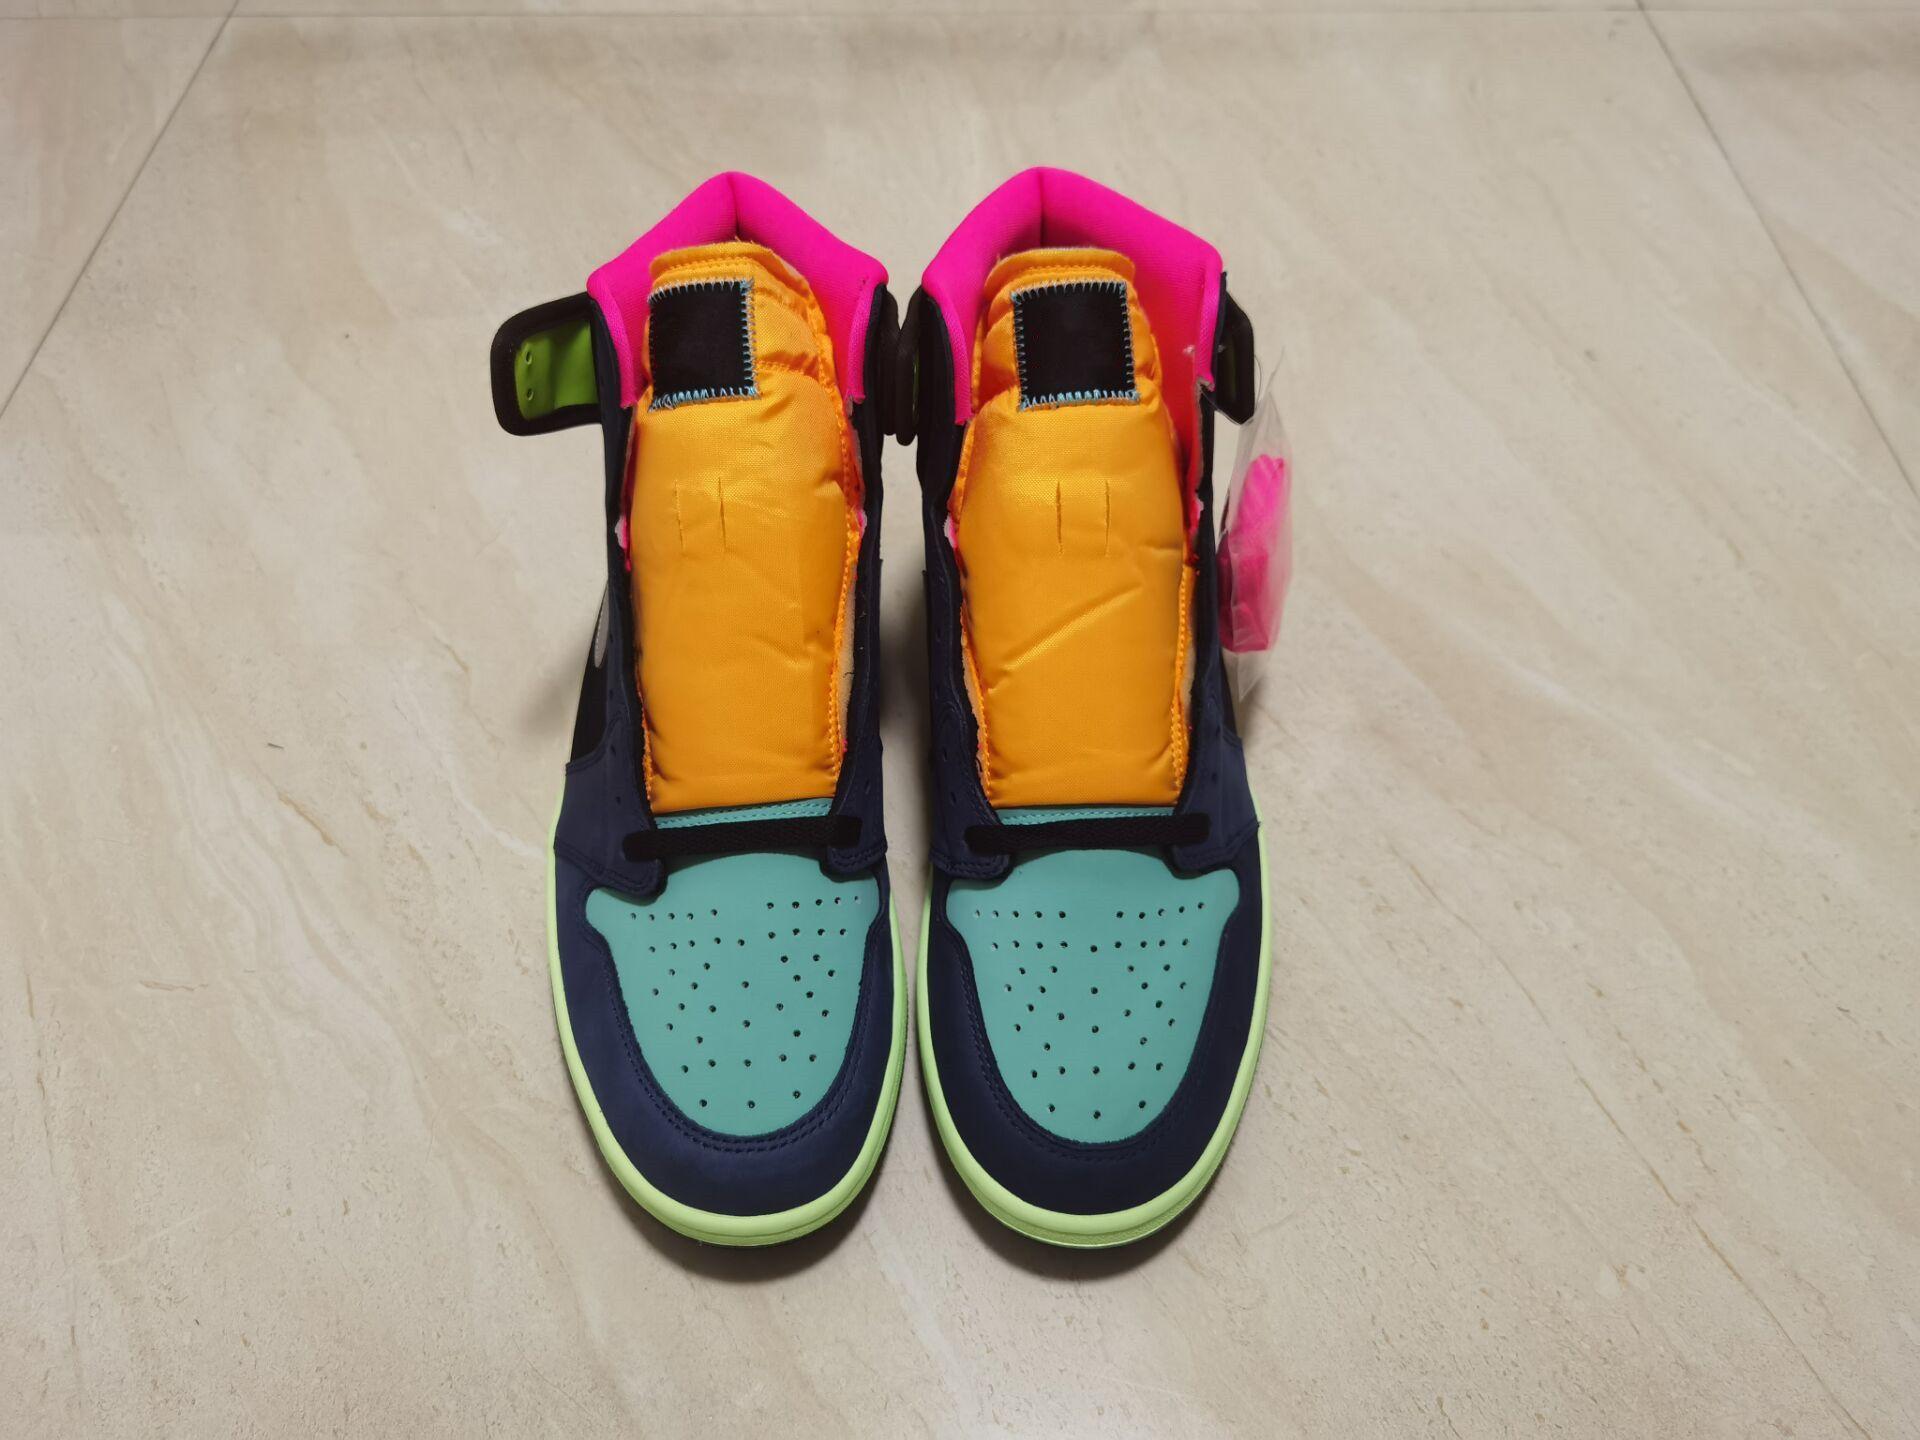 Tokio Bio Hack zapatos de baloncesto zapatos deportivos Calzado hombre